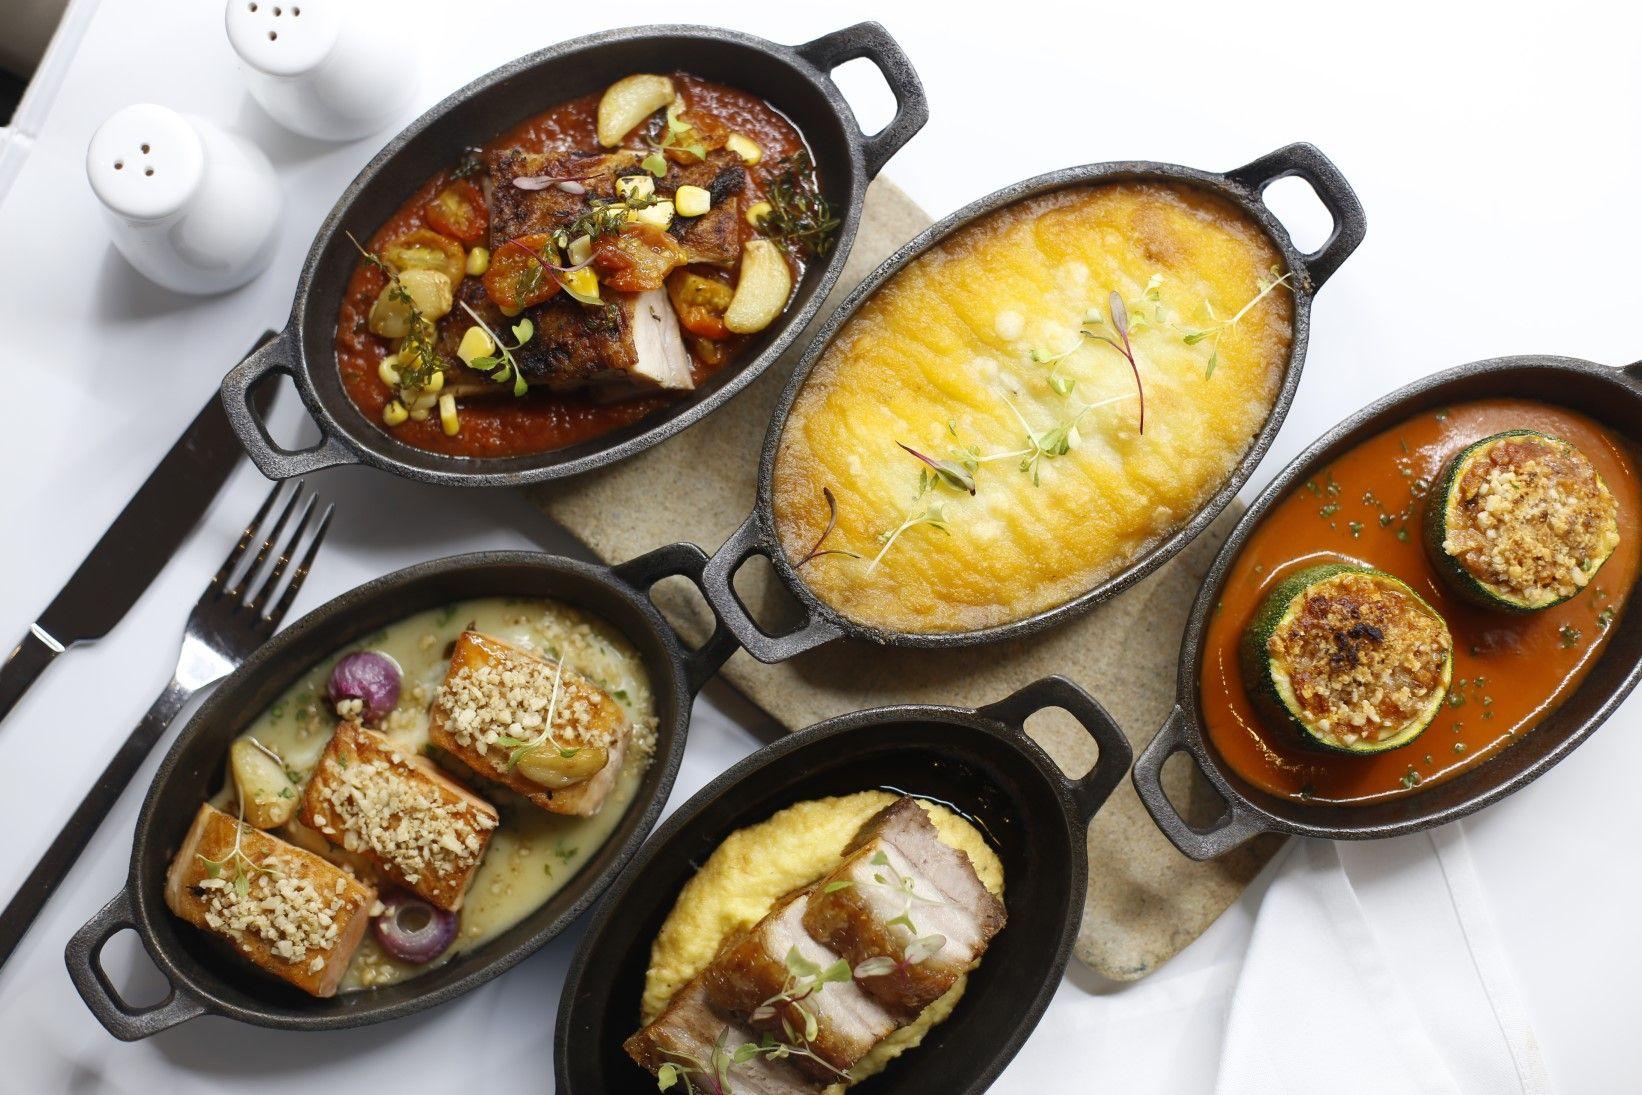 Dining News: A Safer Dining Experience Awaits at Marriott Café